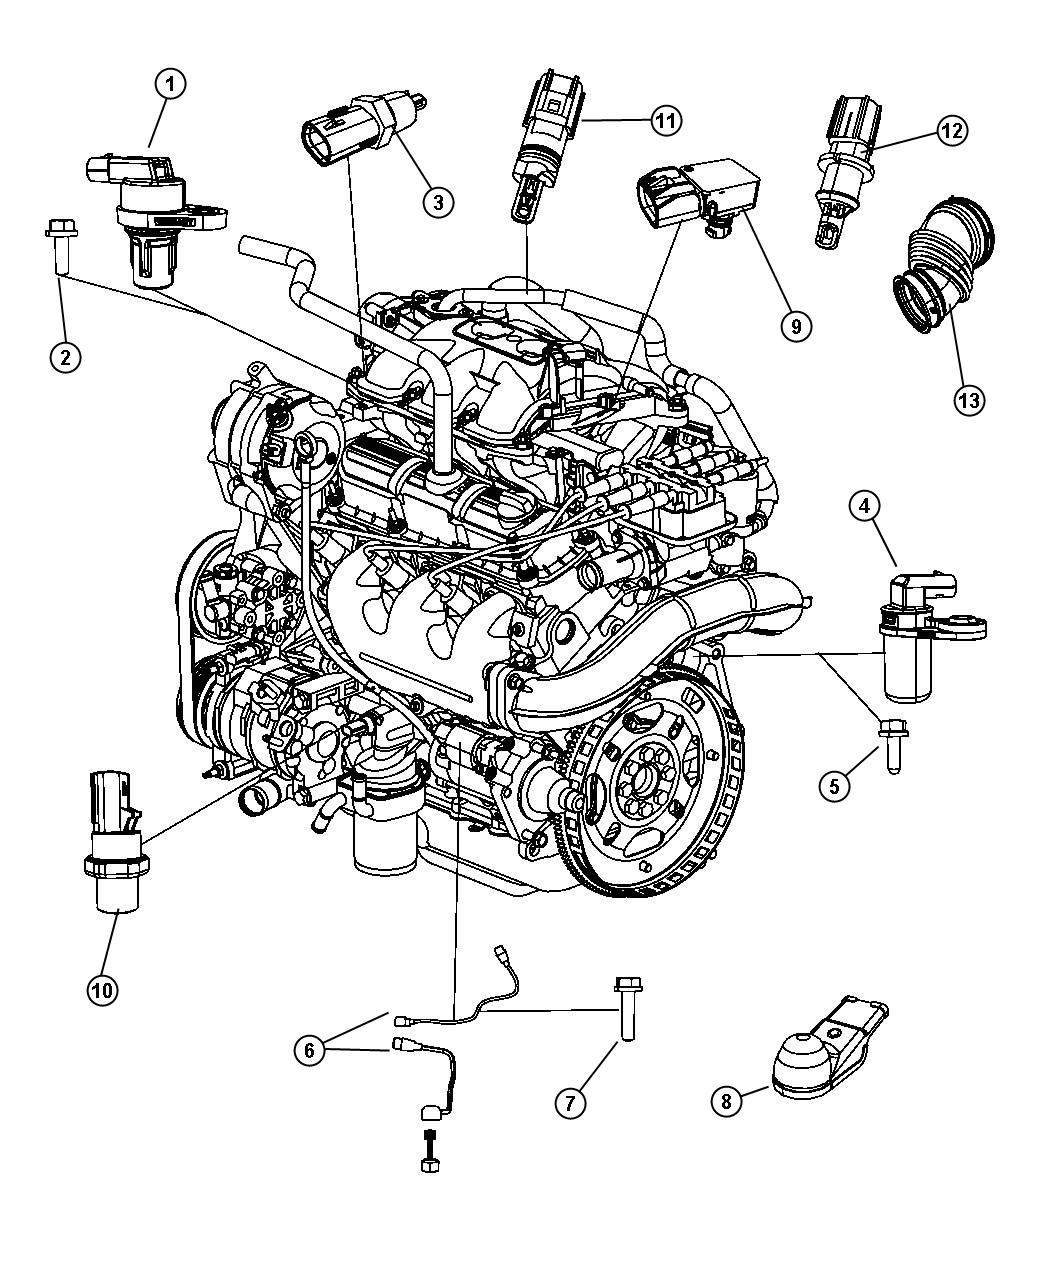 2008 dodge caravan engine schematics 2008 automotive wiring diagrams description i2217577 dodge caravan engine schematics